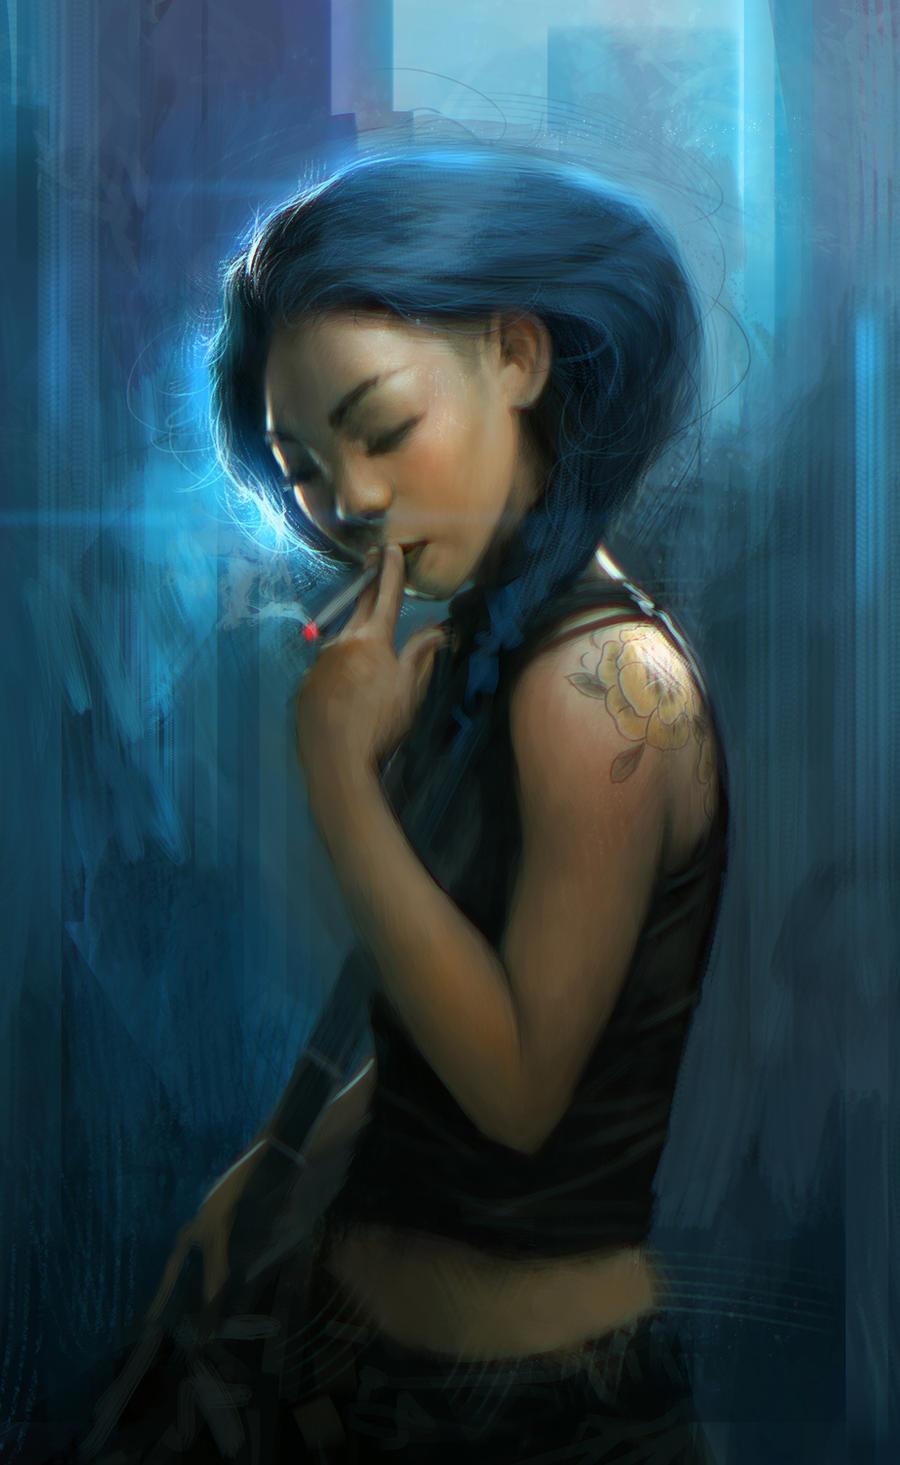 Smoking by clonerh